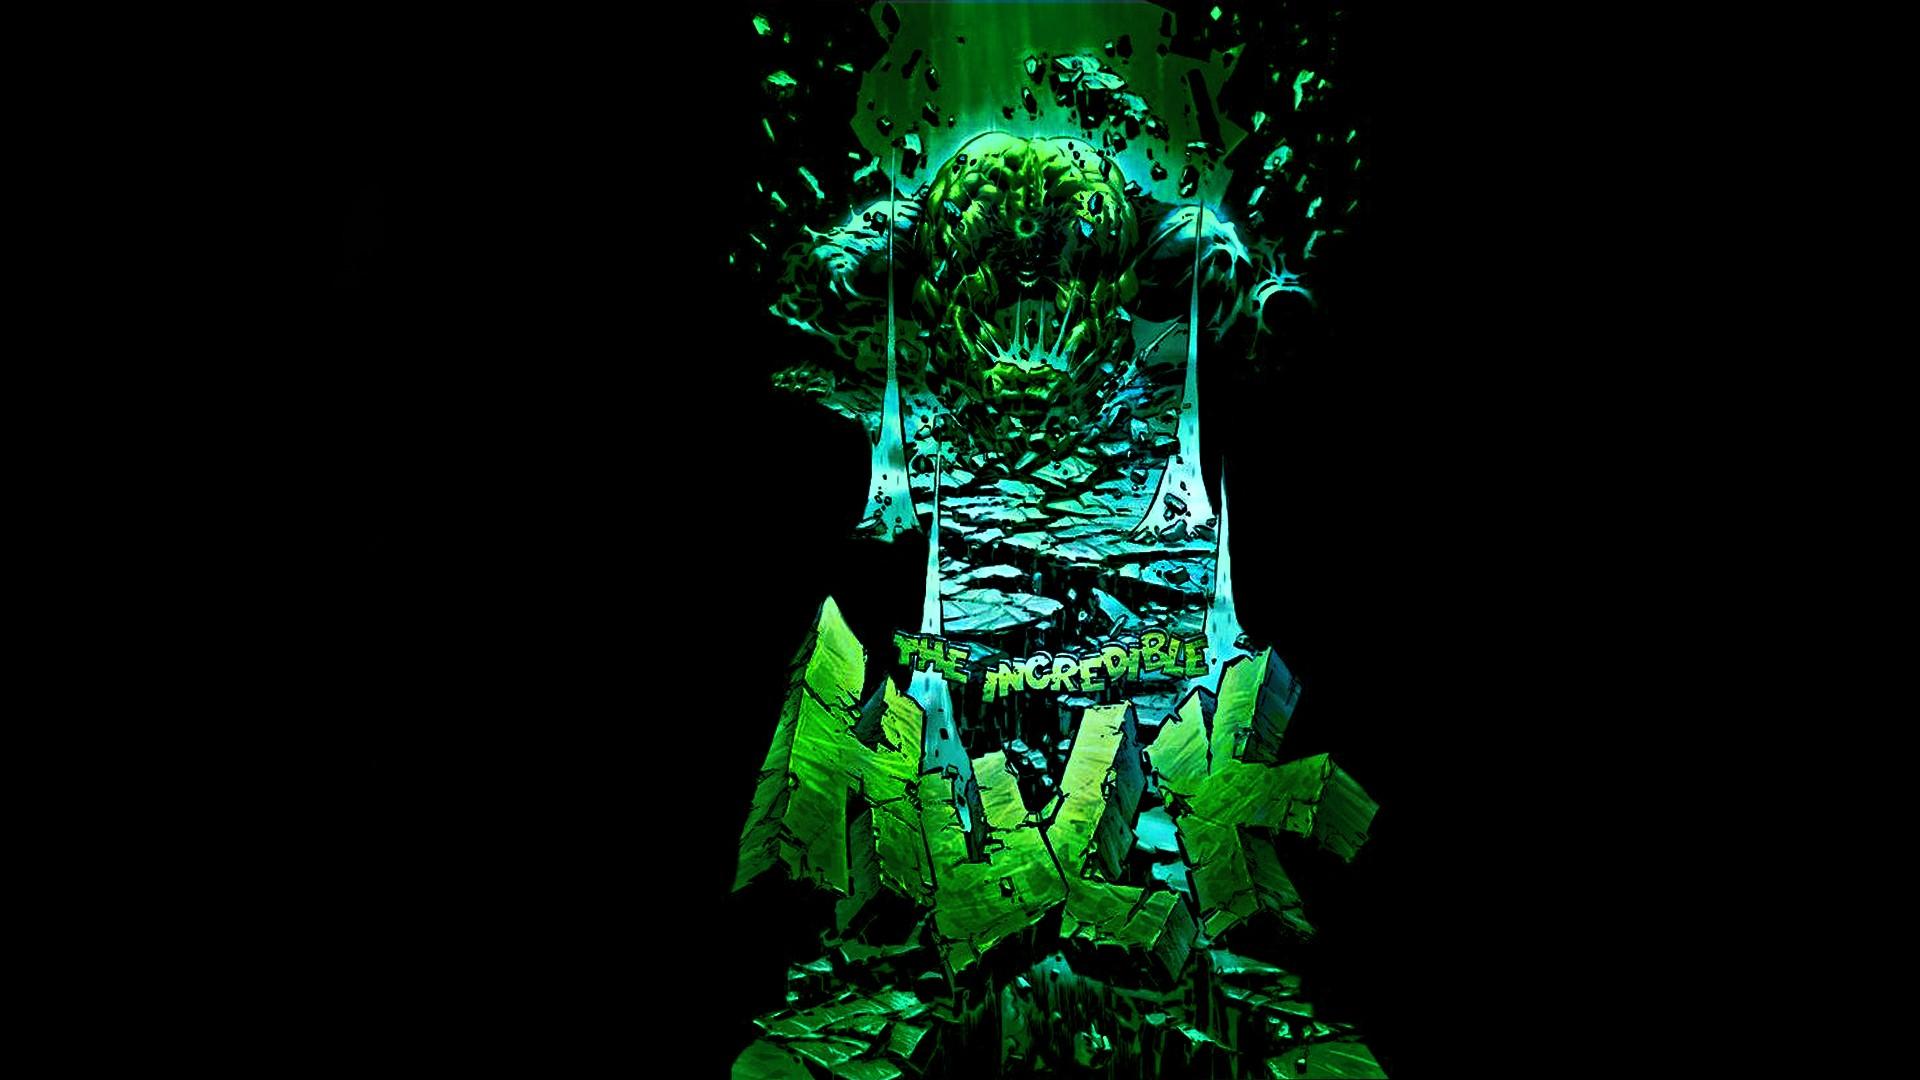 HD Hulk Wallpaper HD Hulk Wallpaper 1920x1080 Hulk wallpaper 1920x1080